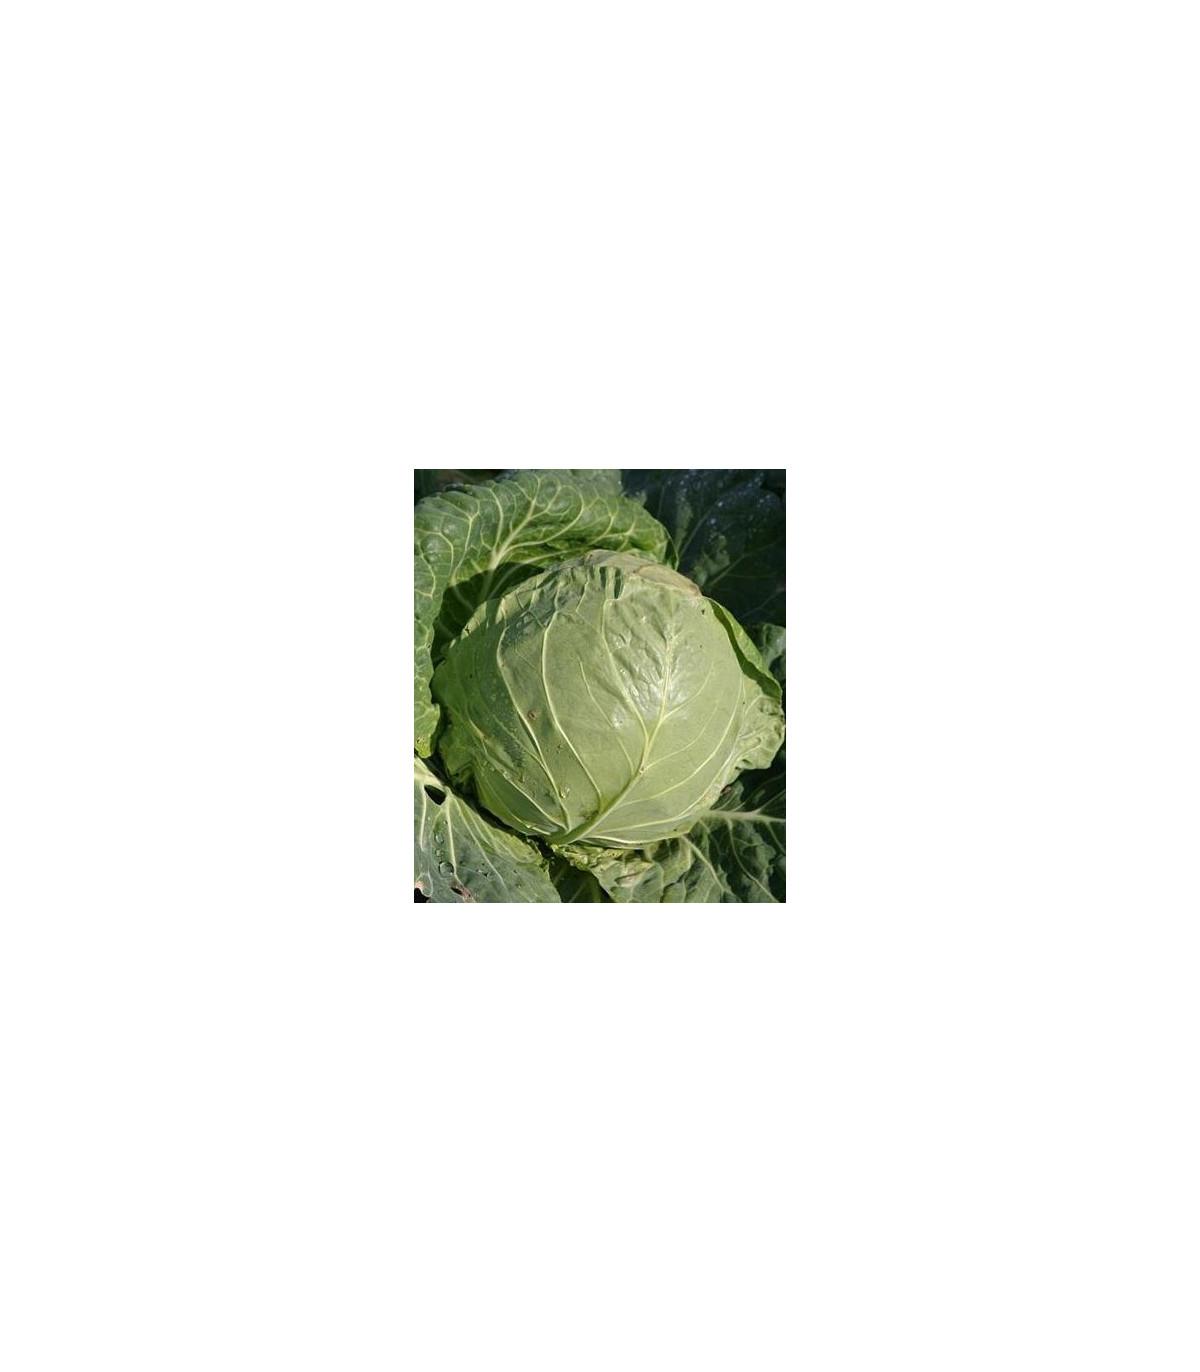 BIO Bílé zelí Premier - prodej bio semen - Brassica oleracea - 0,3 gr